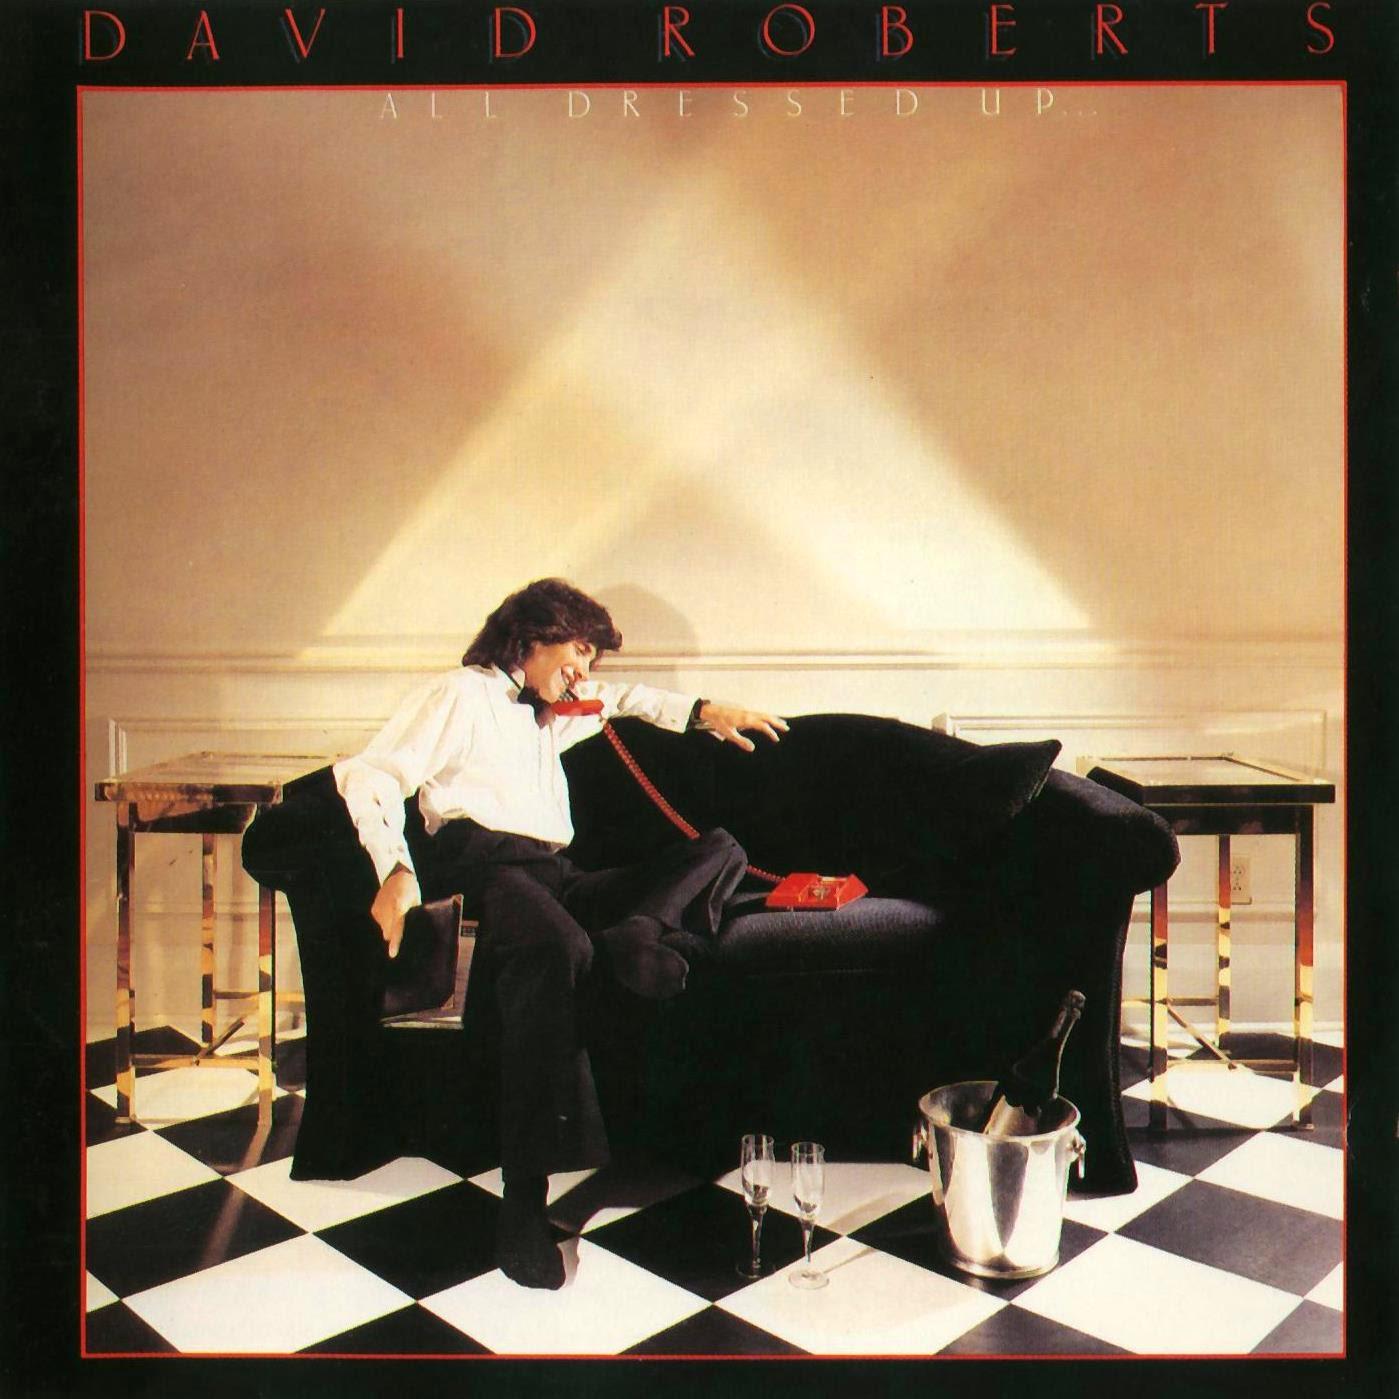 David Roberts All dressep up 1982